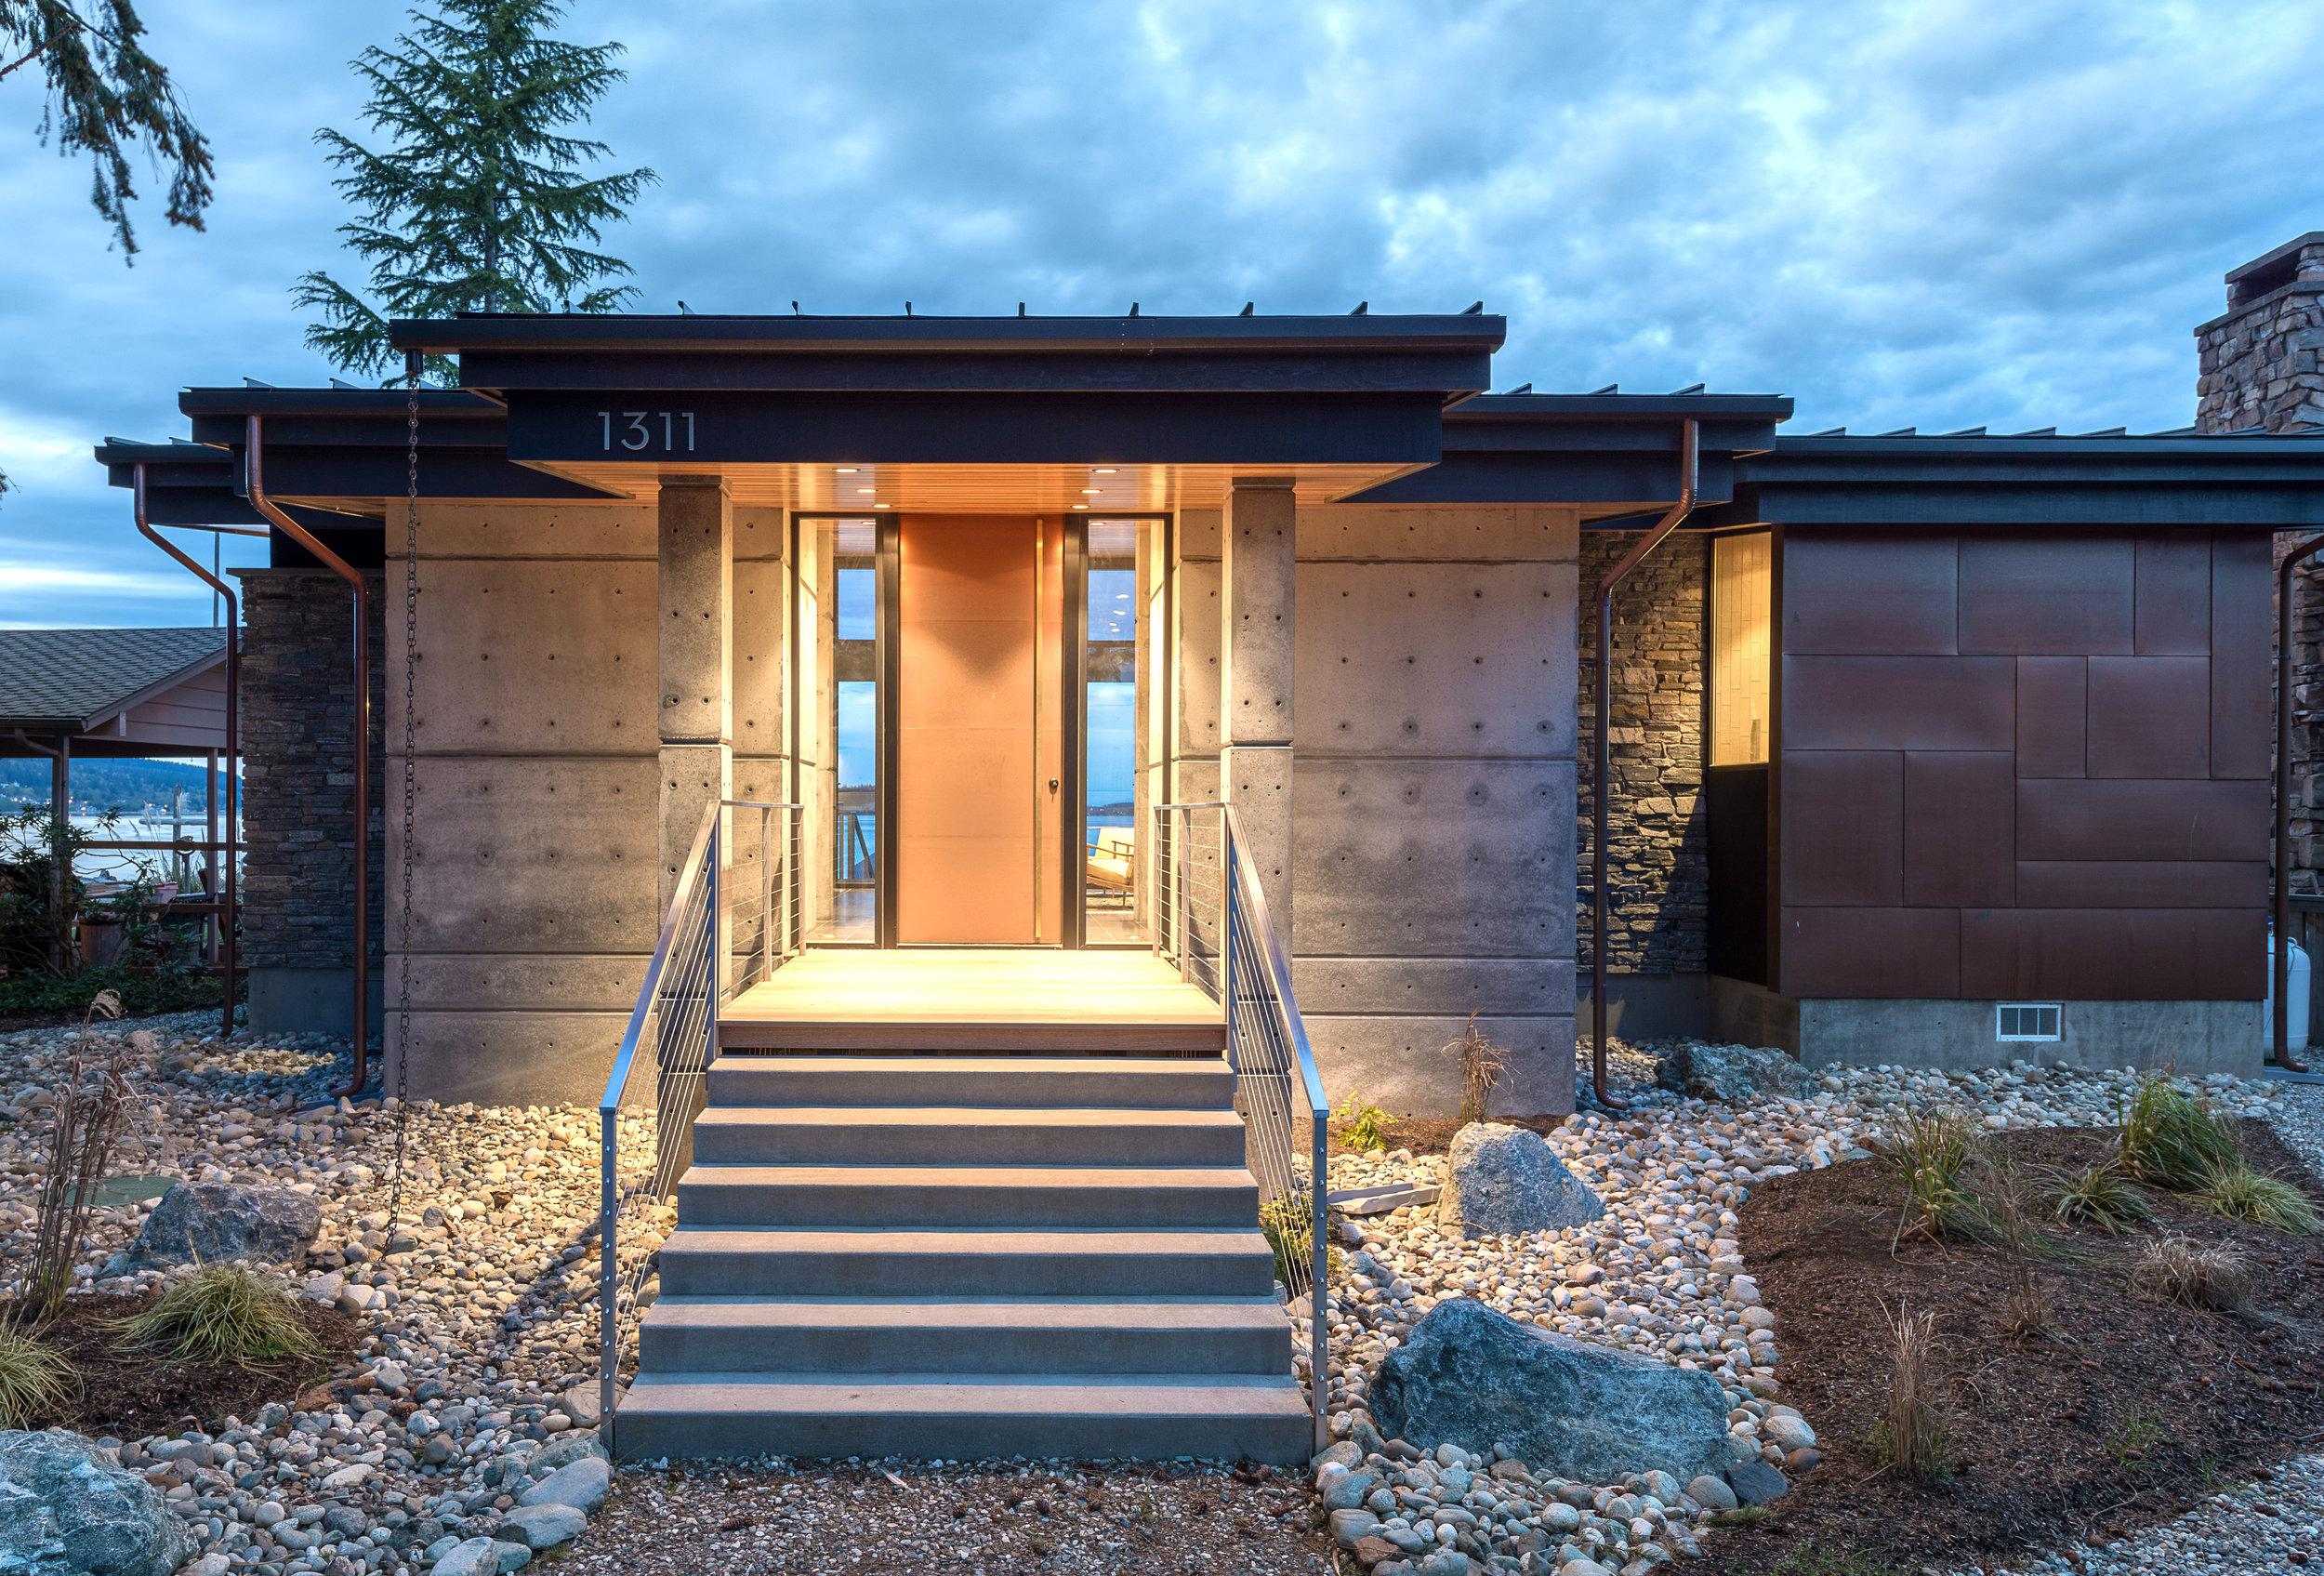 01 - Camano Beach Drive House 5000px - Swift Studio.jpg